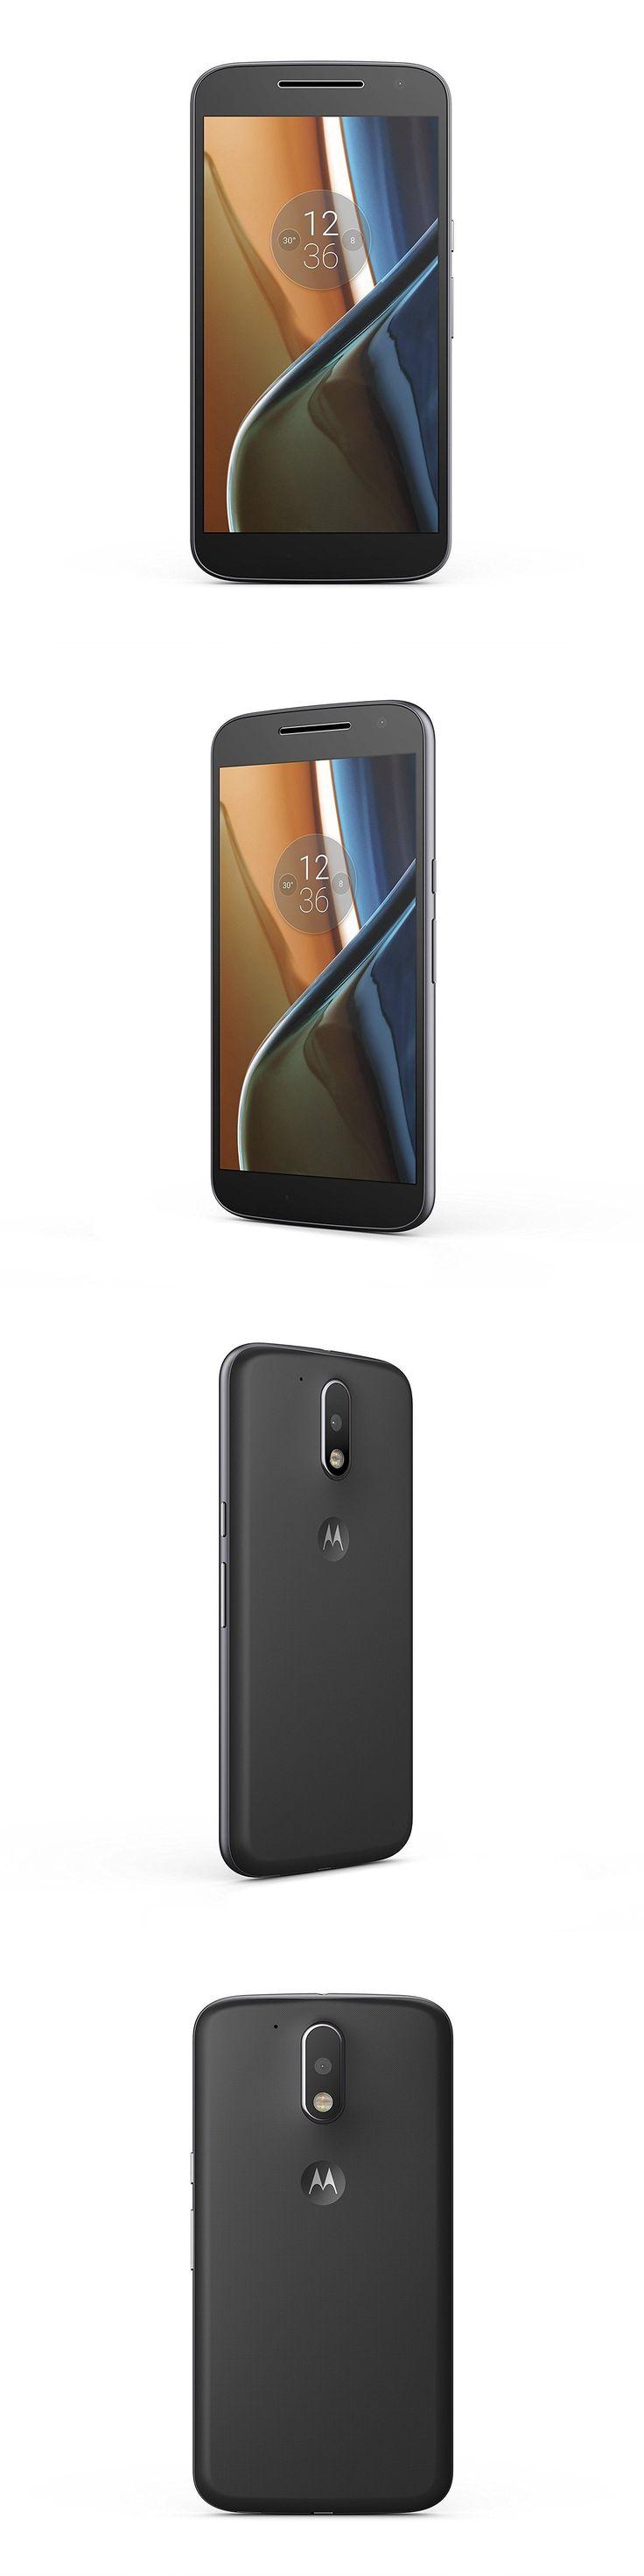 cell phones: Moto G (4Th Gen.) Unlocked - Black - 32Gb Brand New -> BUY IT NOW ONLY: $158.99 on eBay!